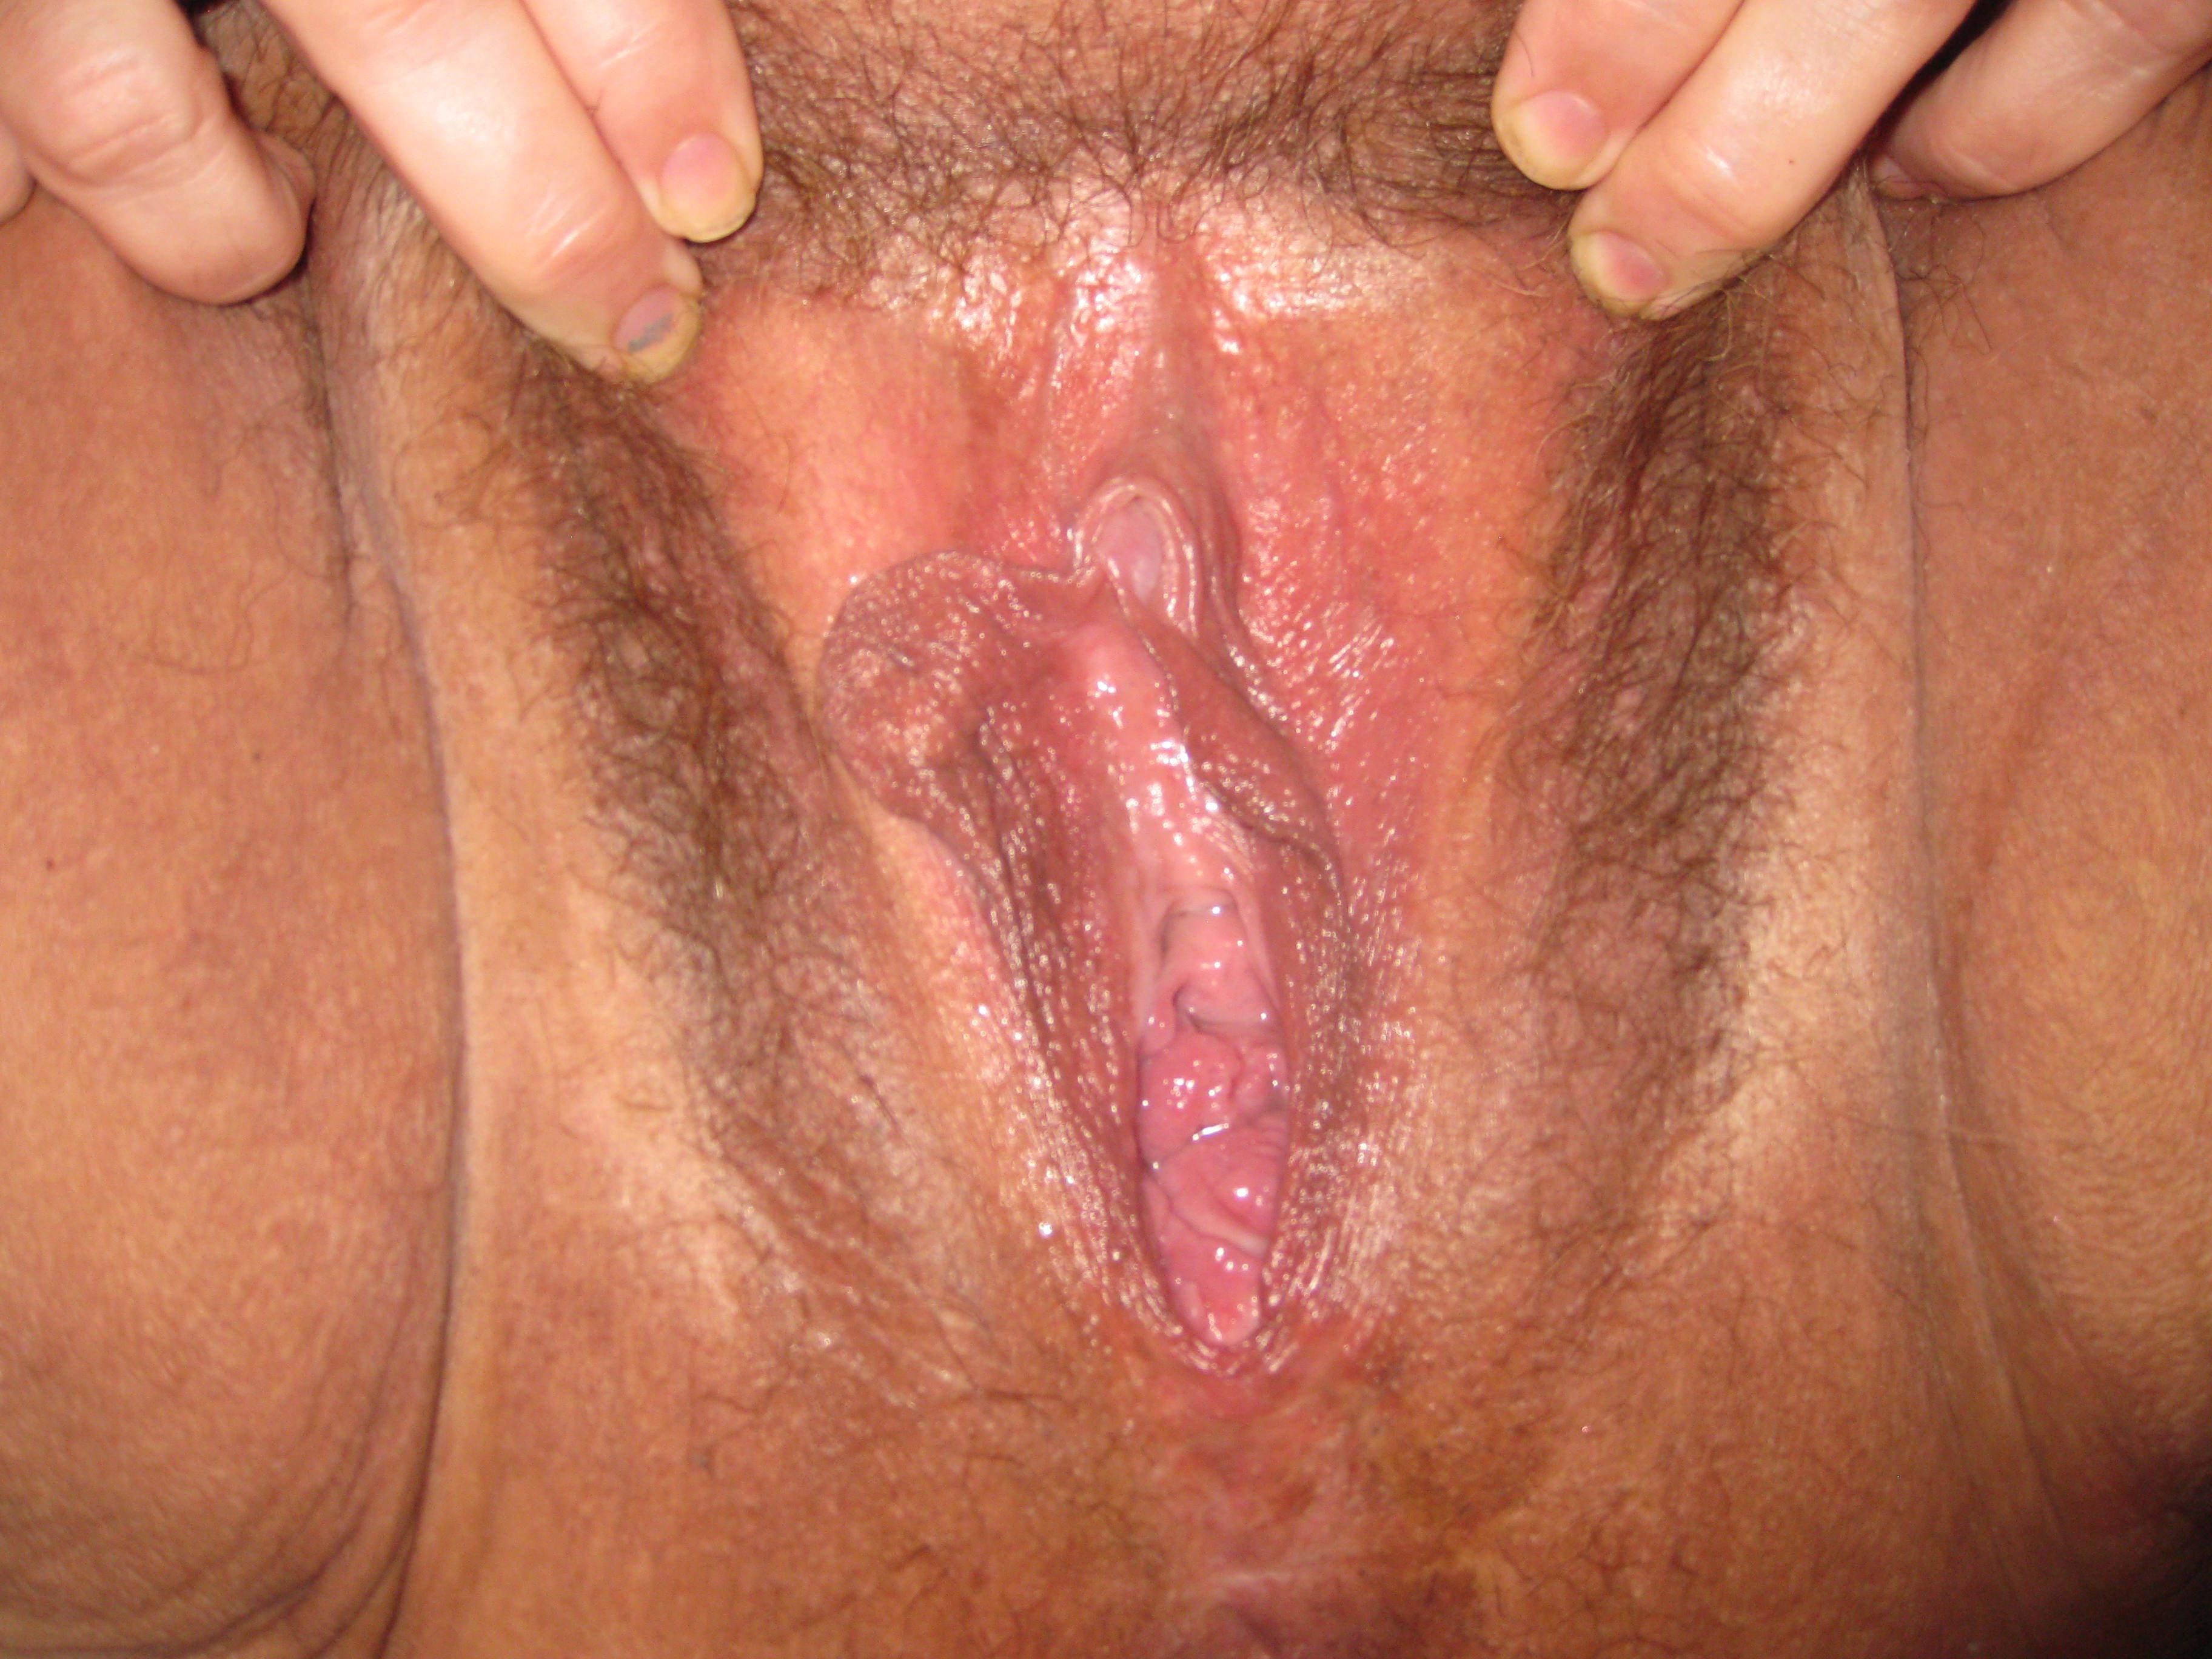 hot amateur nude pics